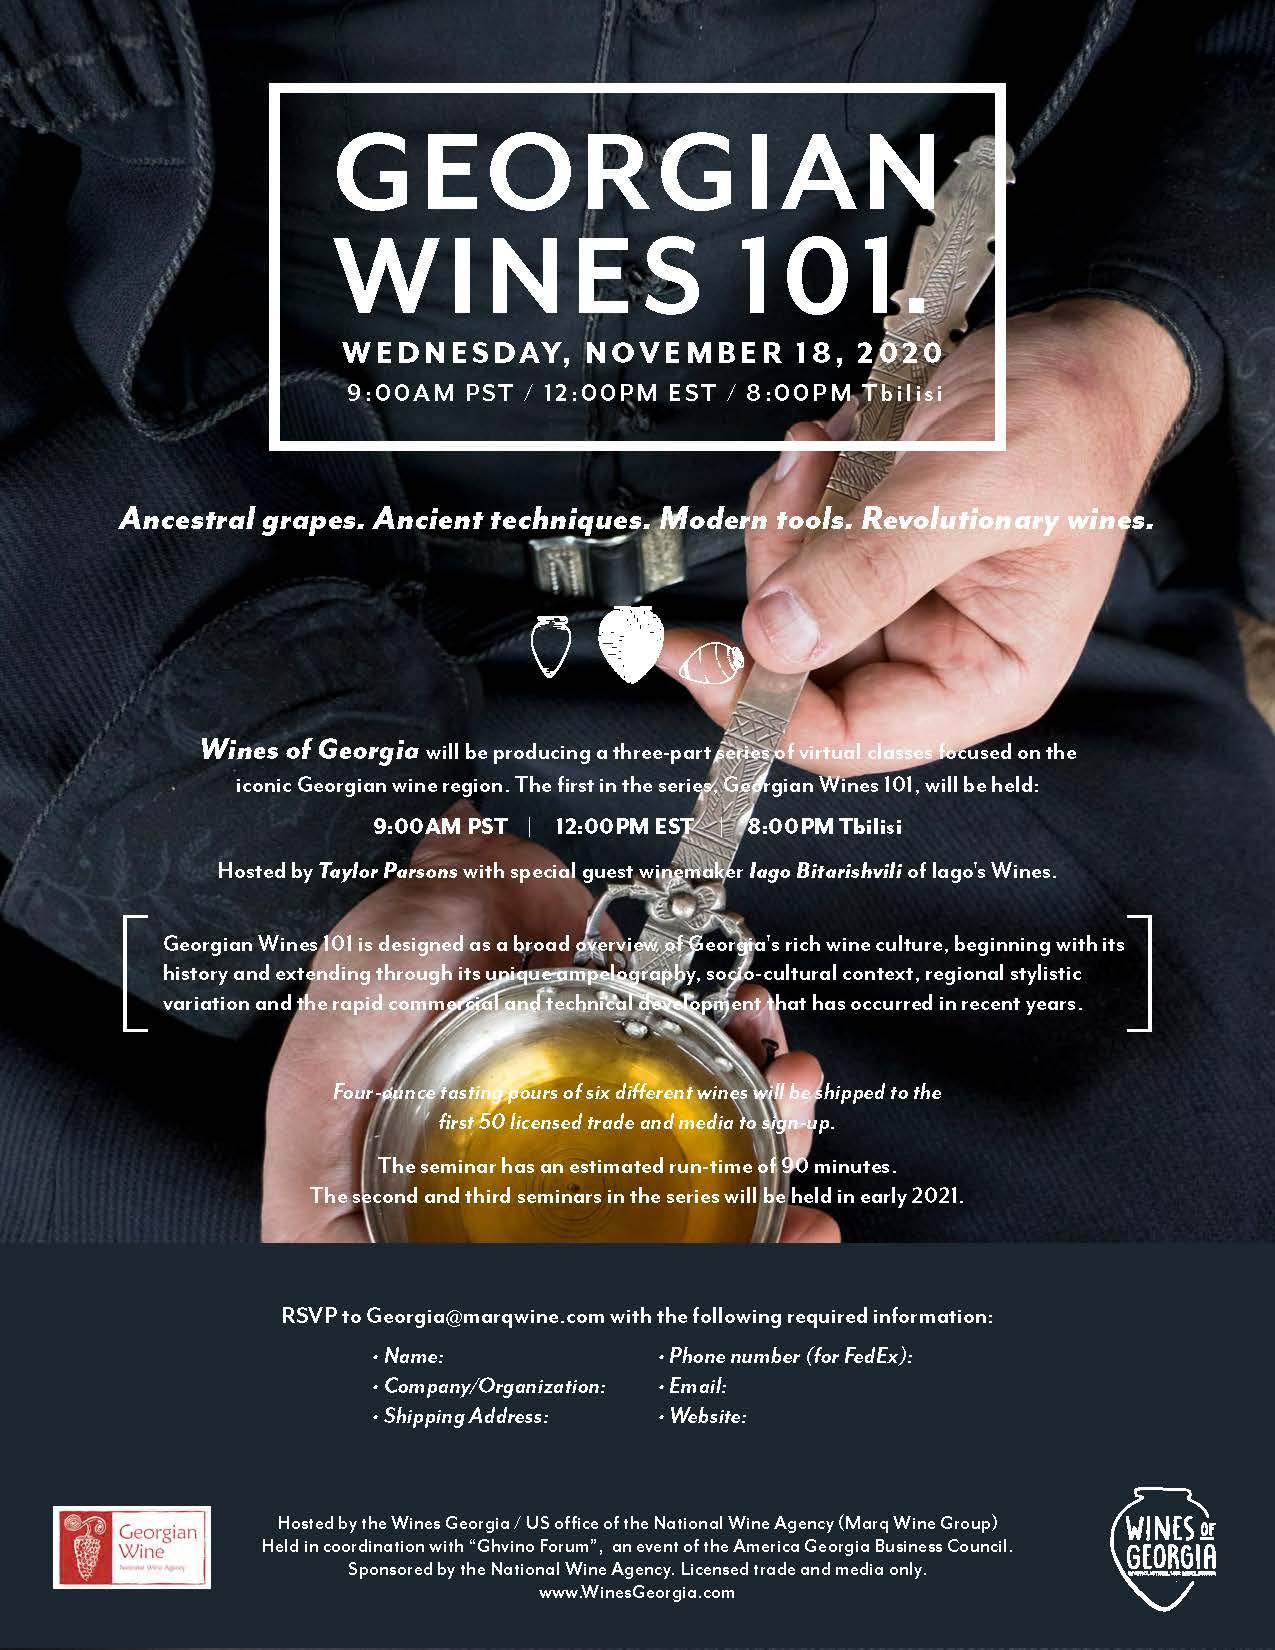 Georgian Wine 101